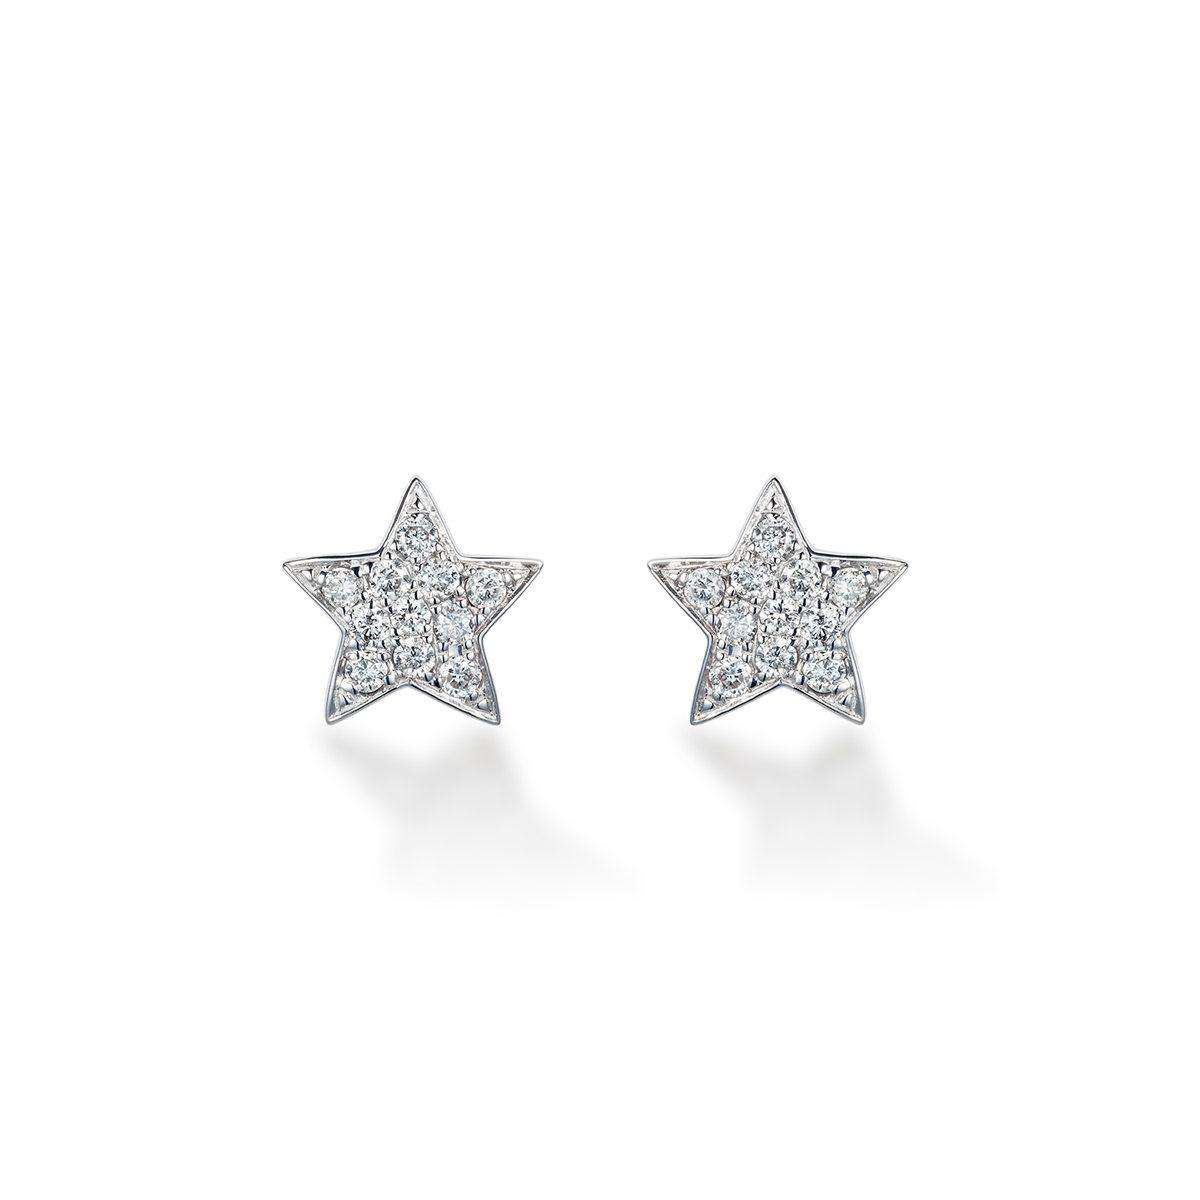 Robinson-Pelham-Ltd-Earrings-6